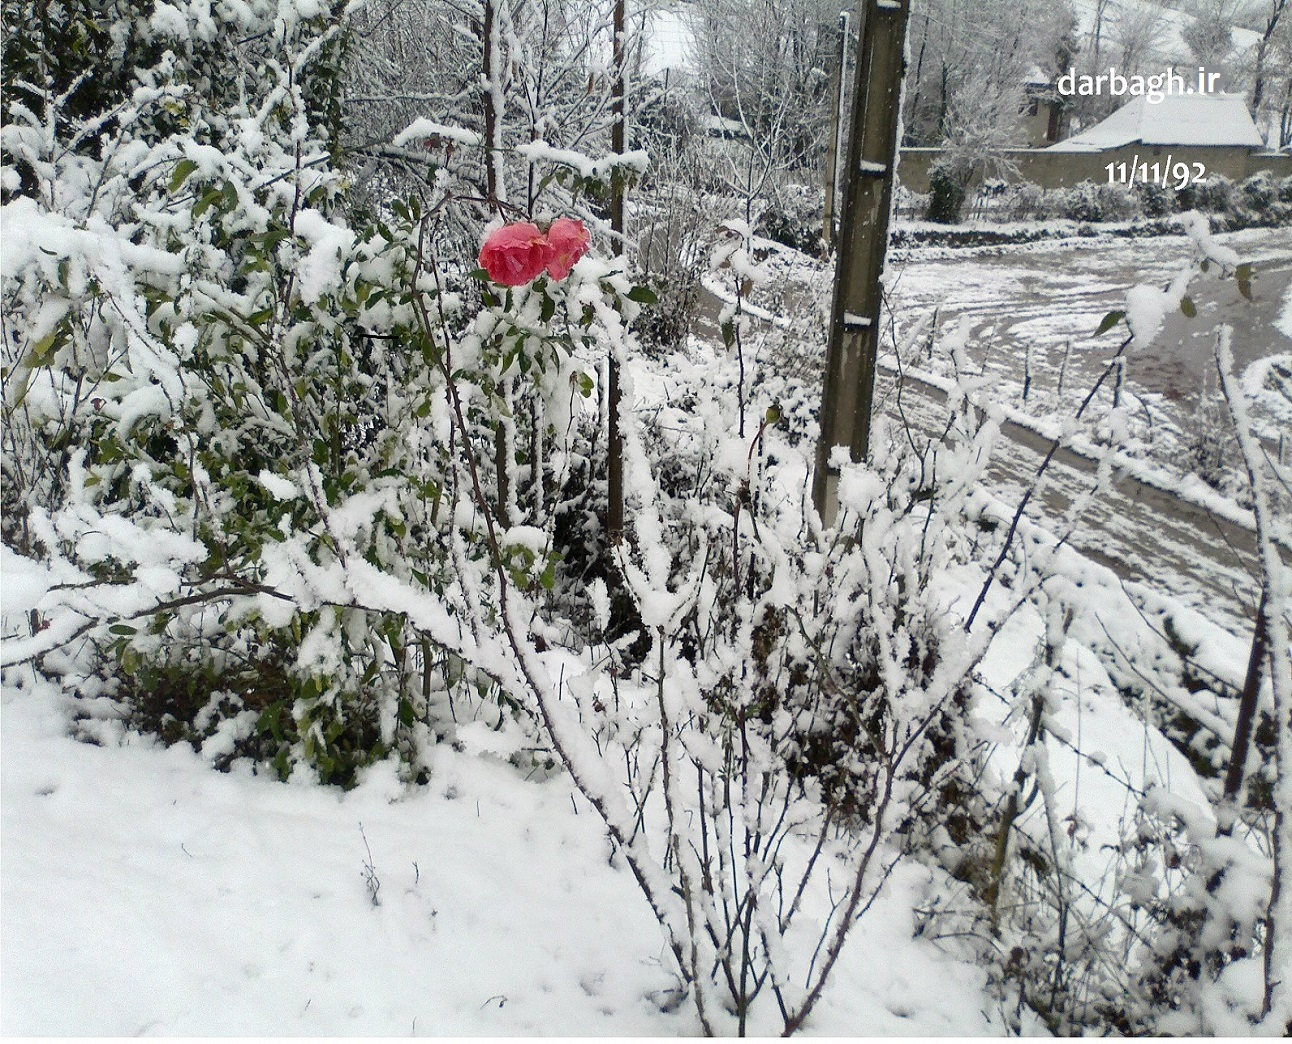 barf darbagh ir 11 11 6  اولین برف زمستانی 92 دارباغ بخش اول